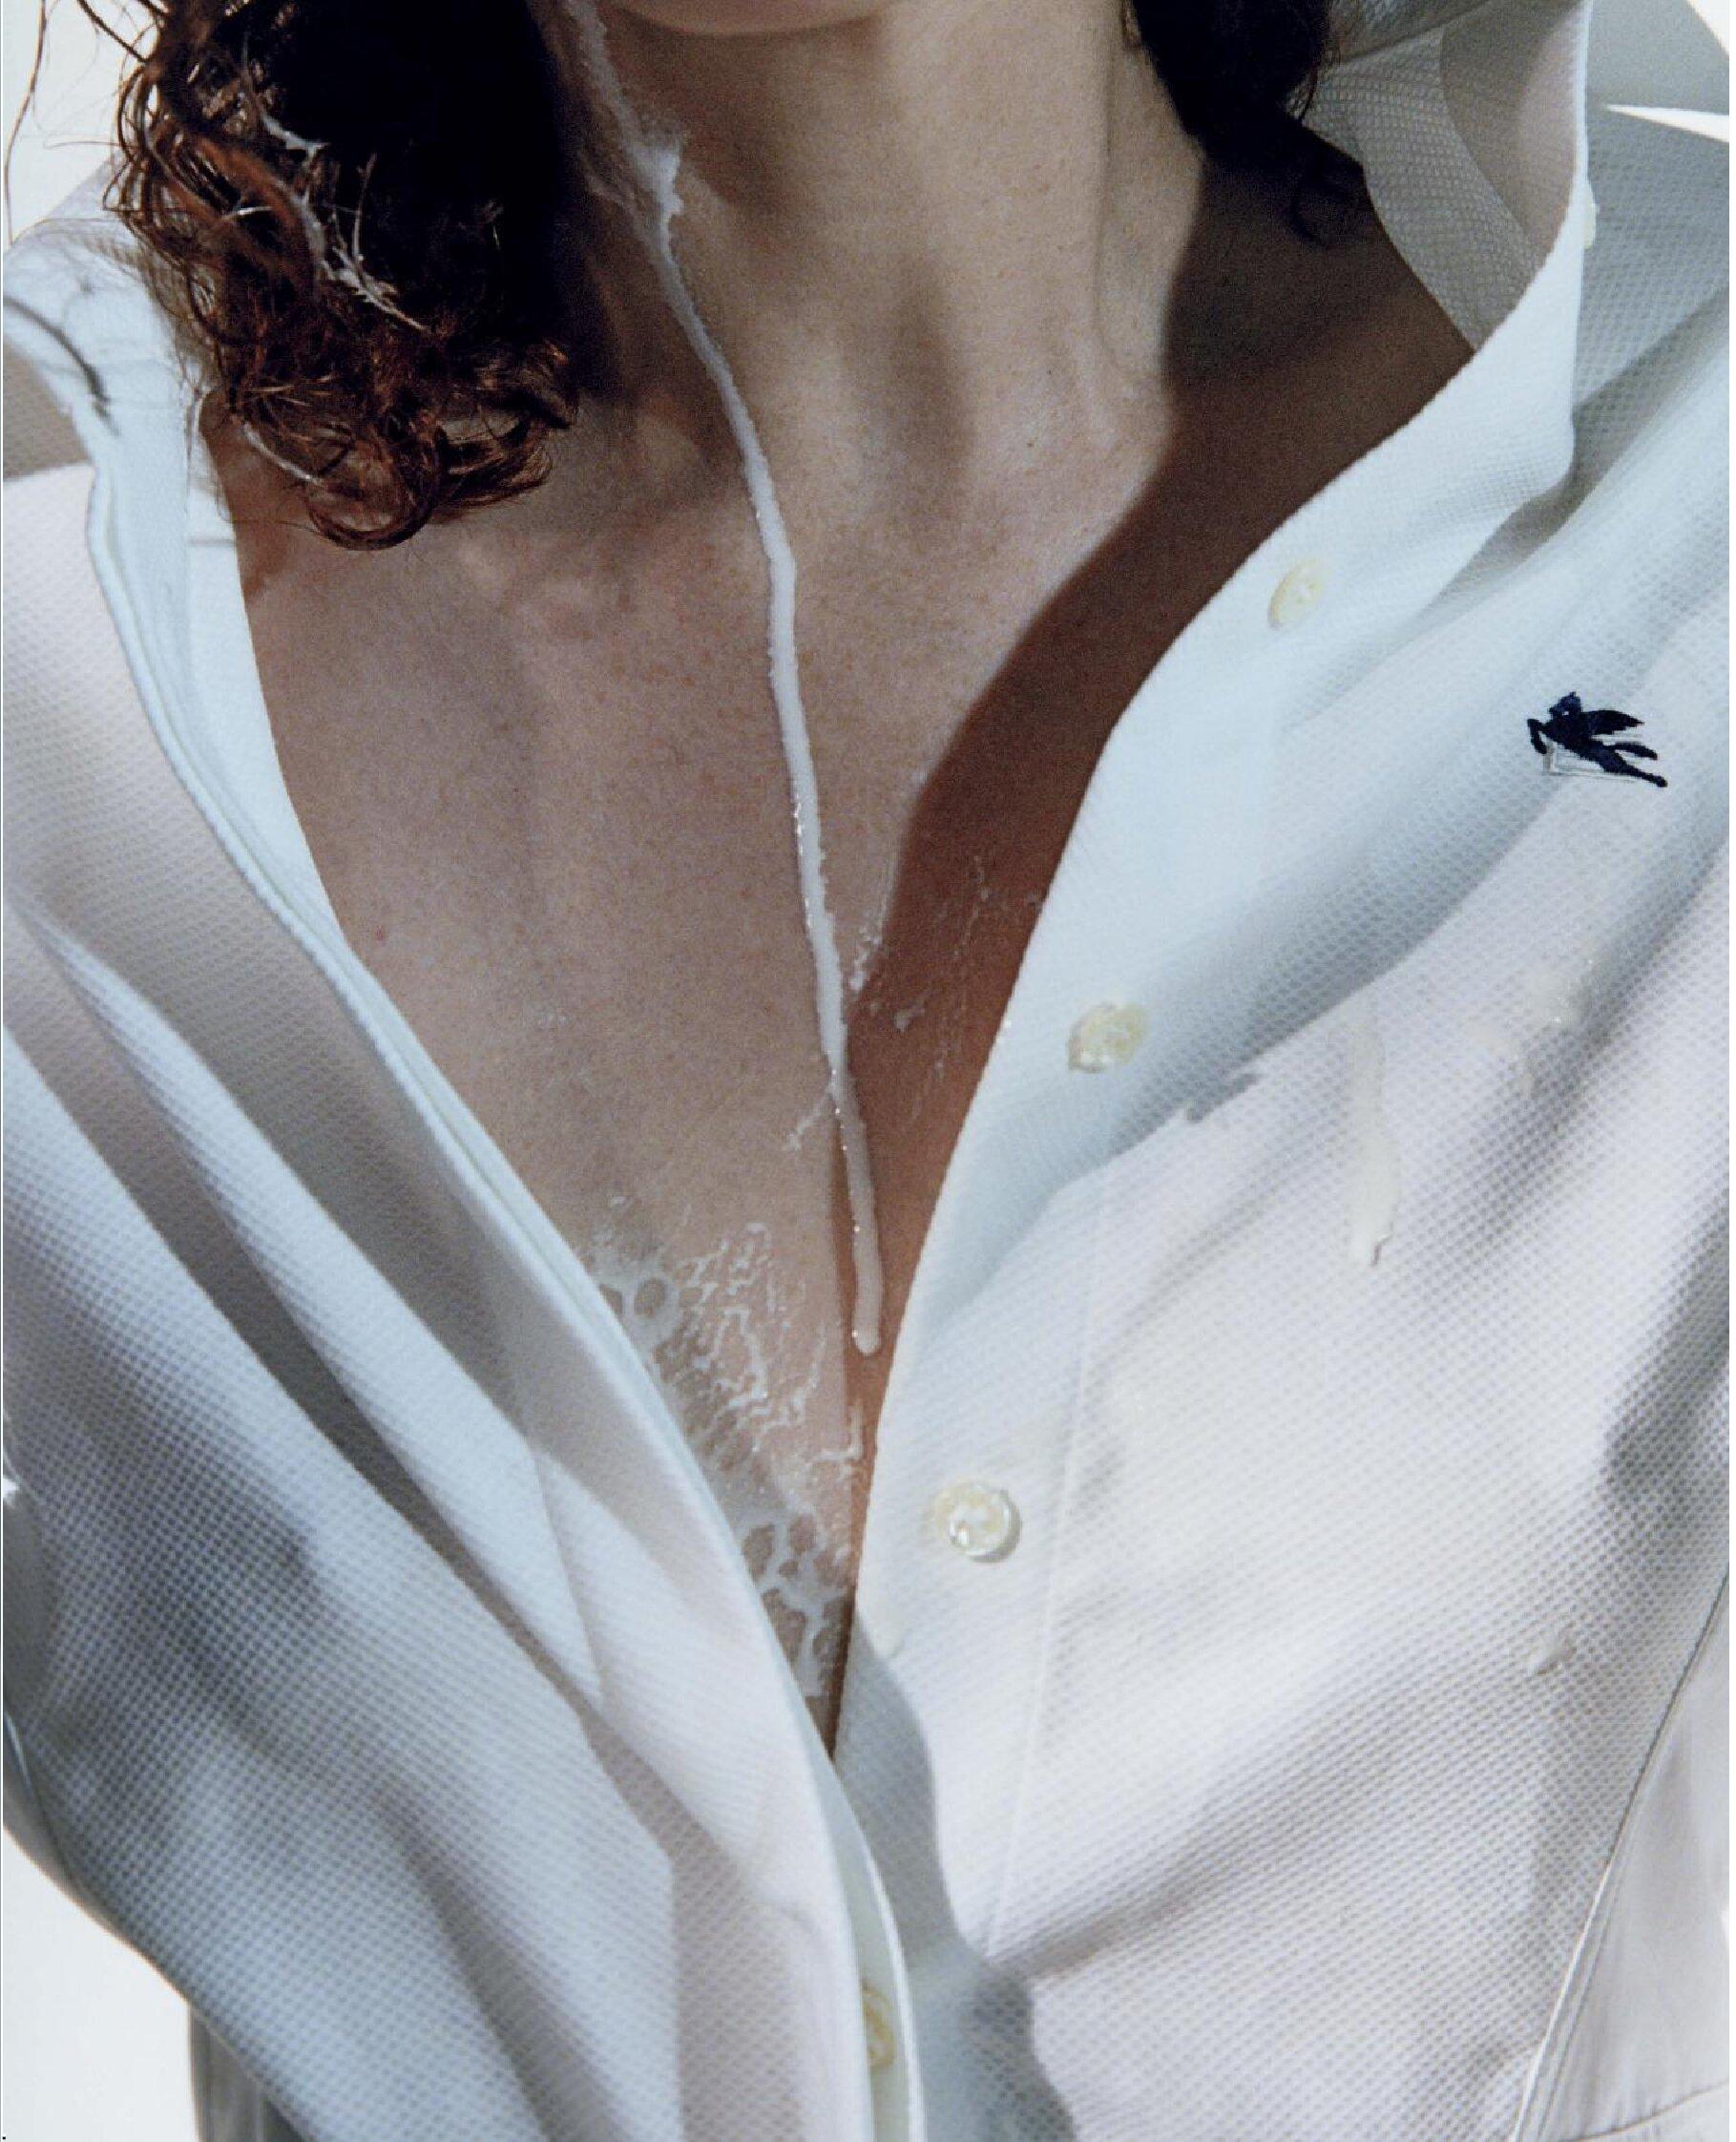 Karen Elson by Harley Weir for Vogue Italia July 2019 (12).jpg